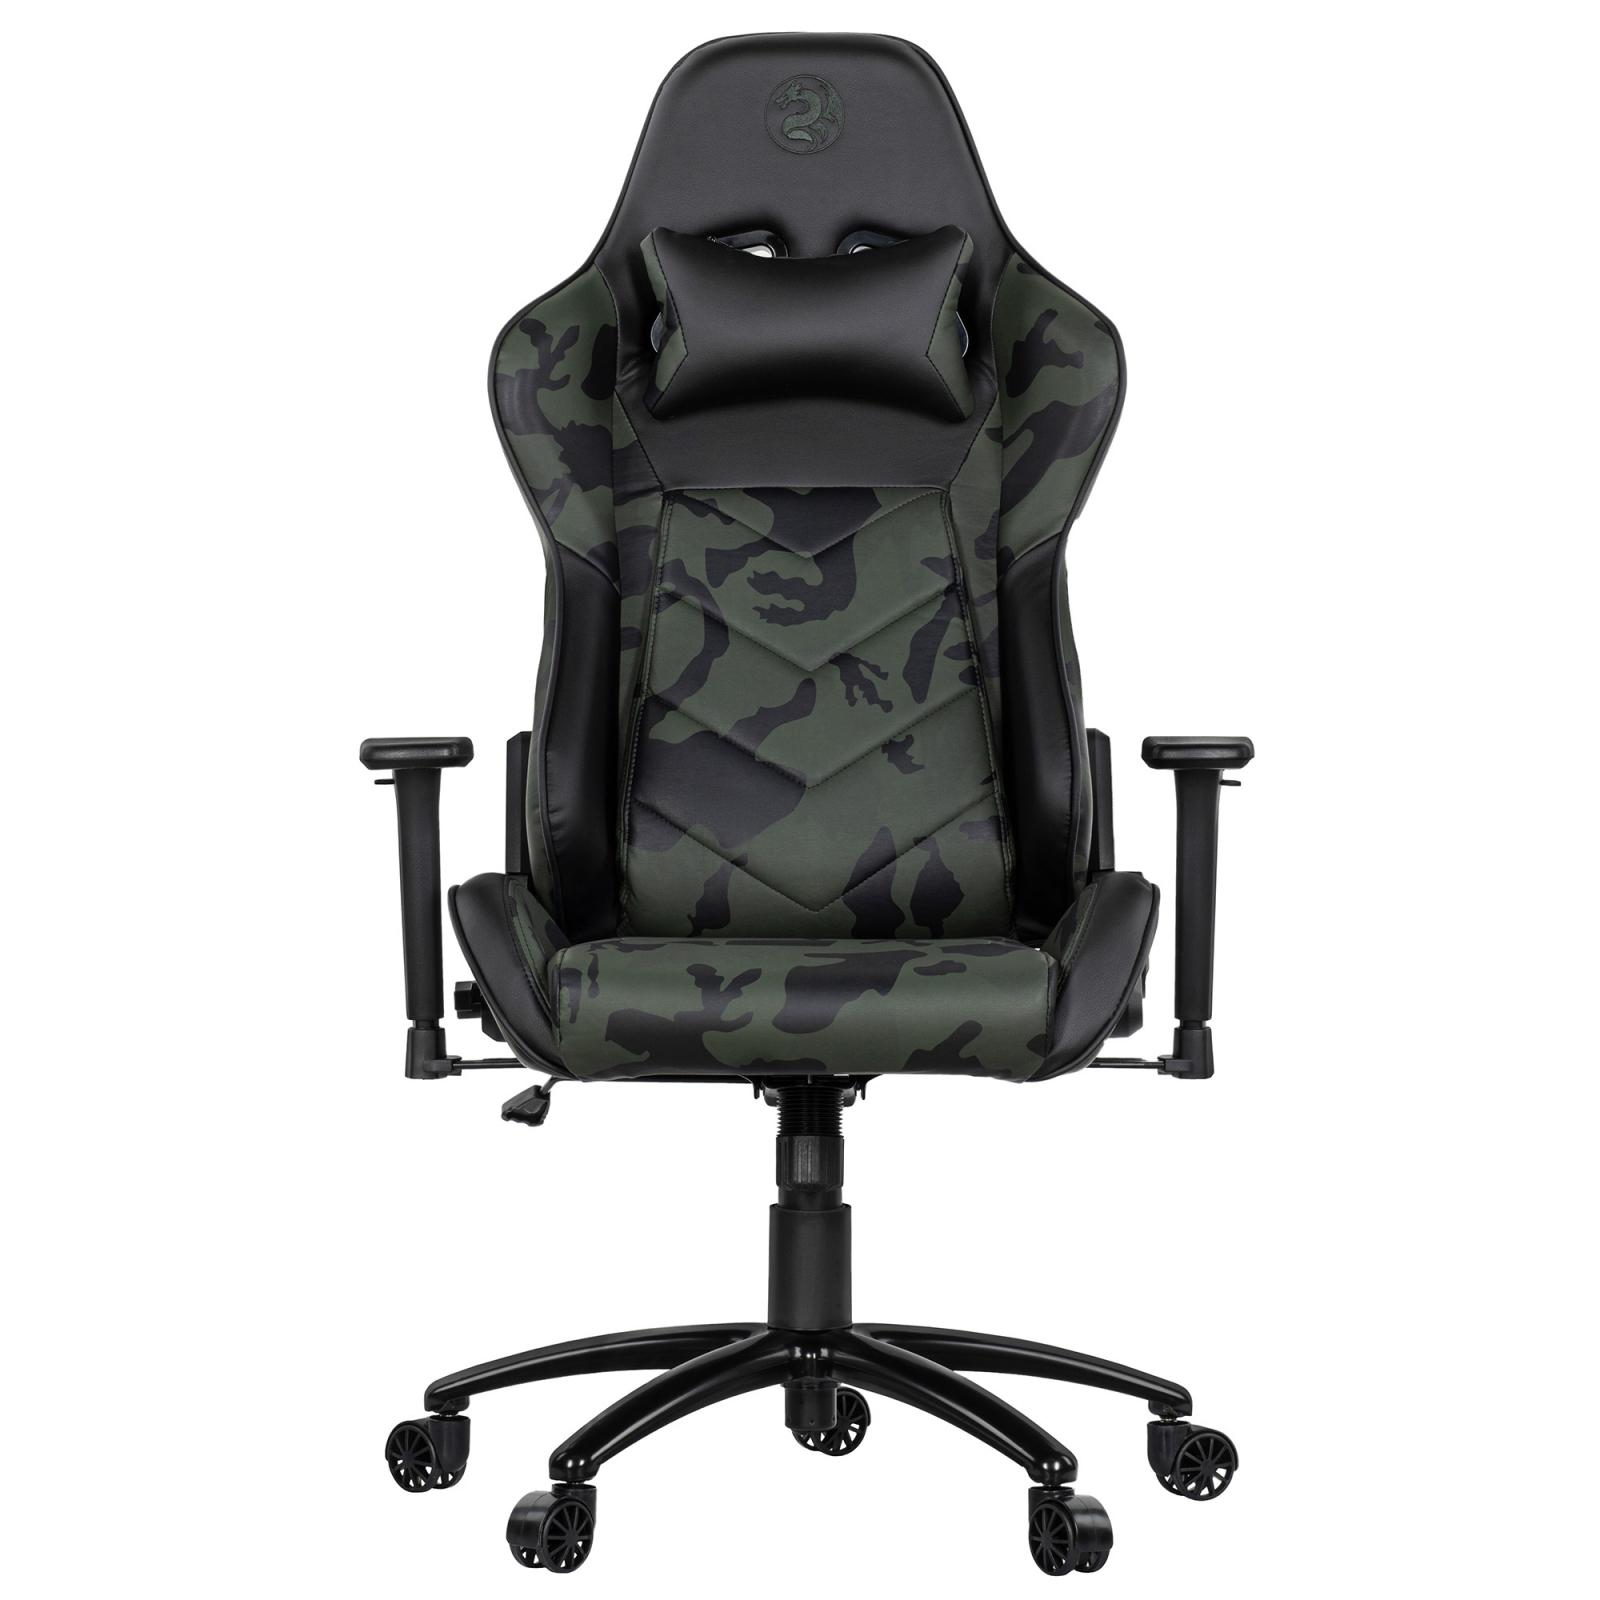 Крісло ігрове 2E GC22 Camouflage (2E-GC22CAM) зображення 2